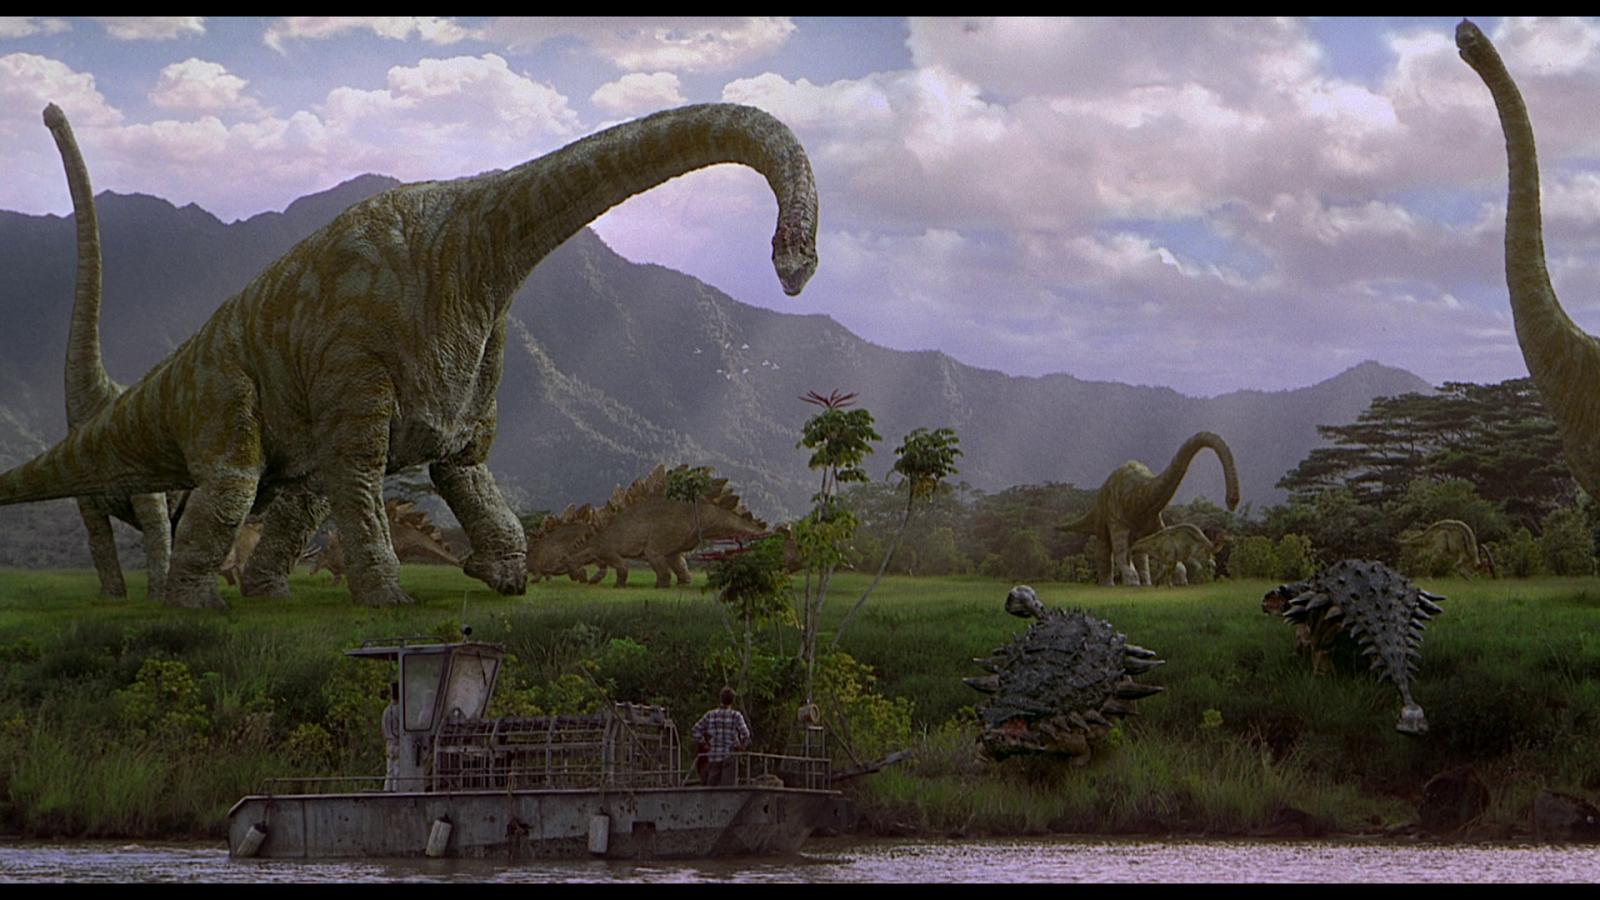 [48+] Jurassic Park Wallpapers HD on WallpaperSafari